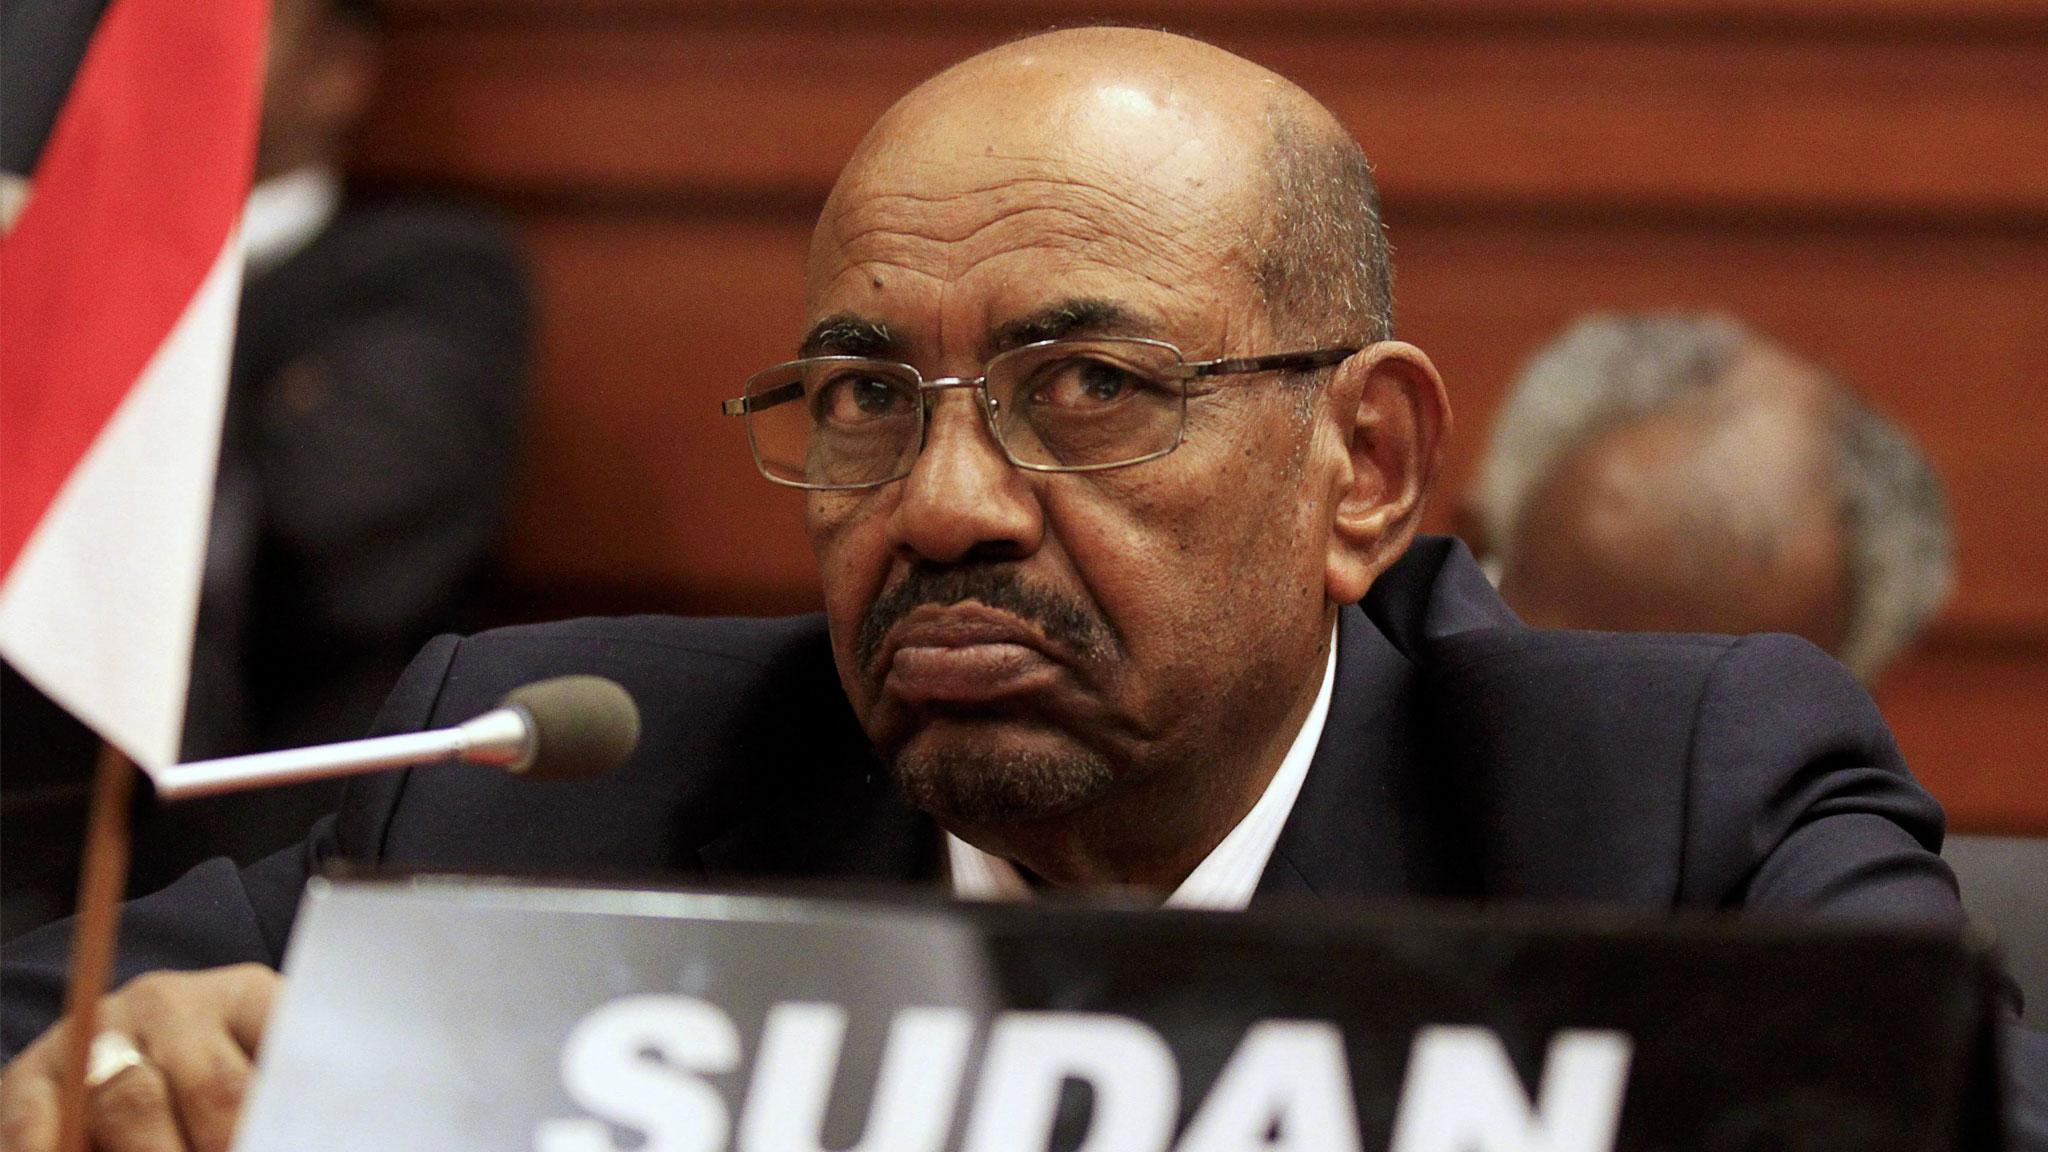 Sudan prosecutors slam embattled Al-Bashir with fresh corruption charges